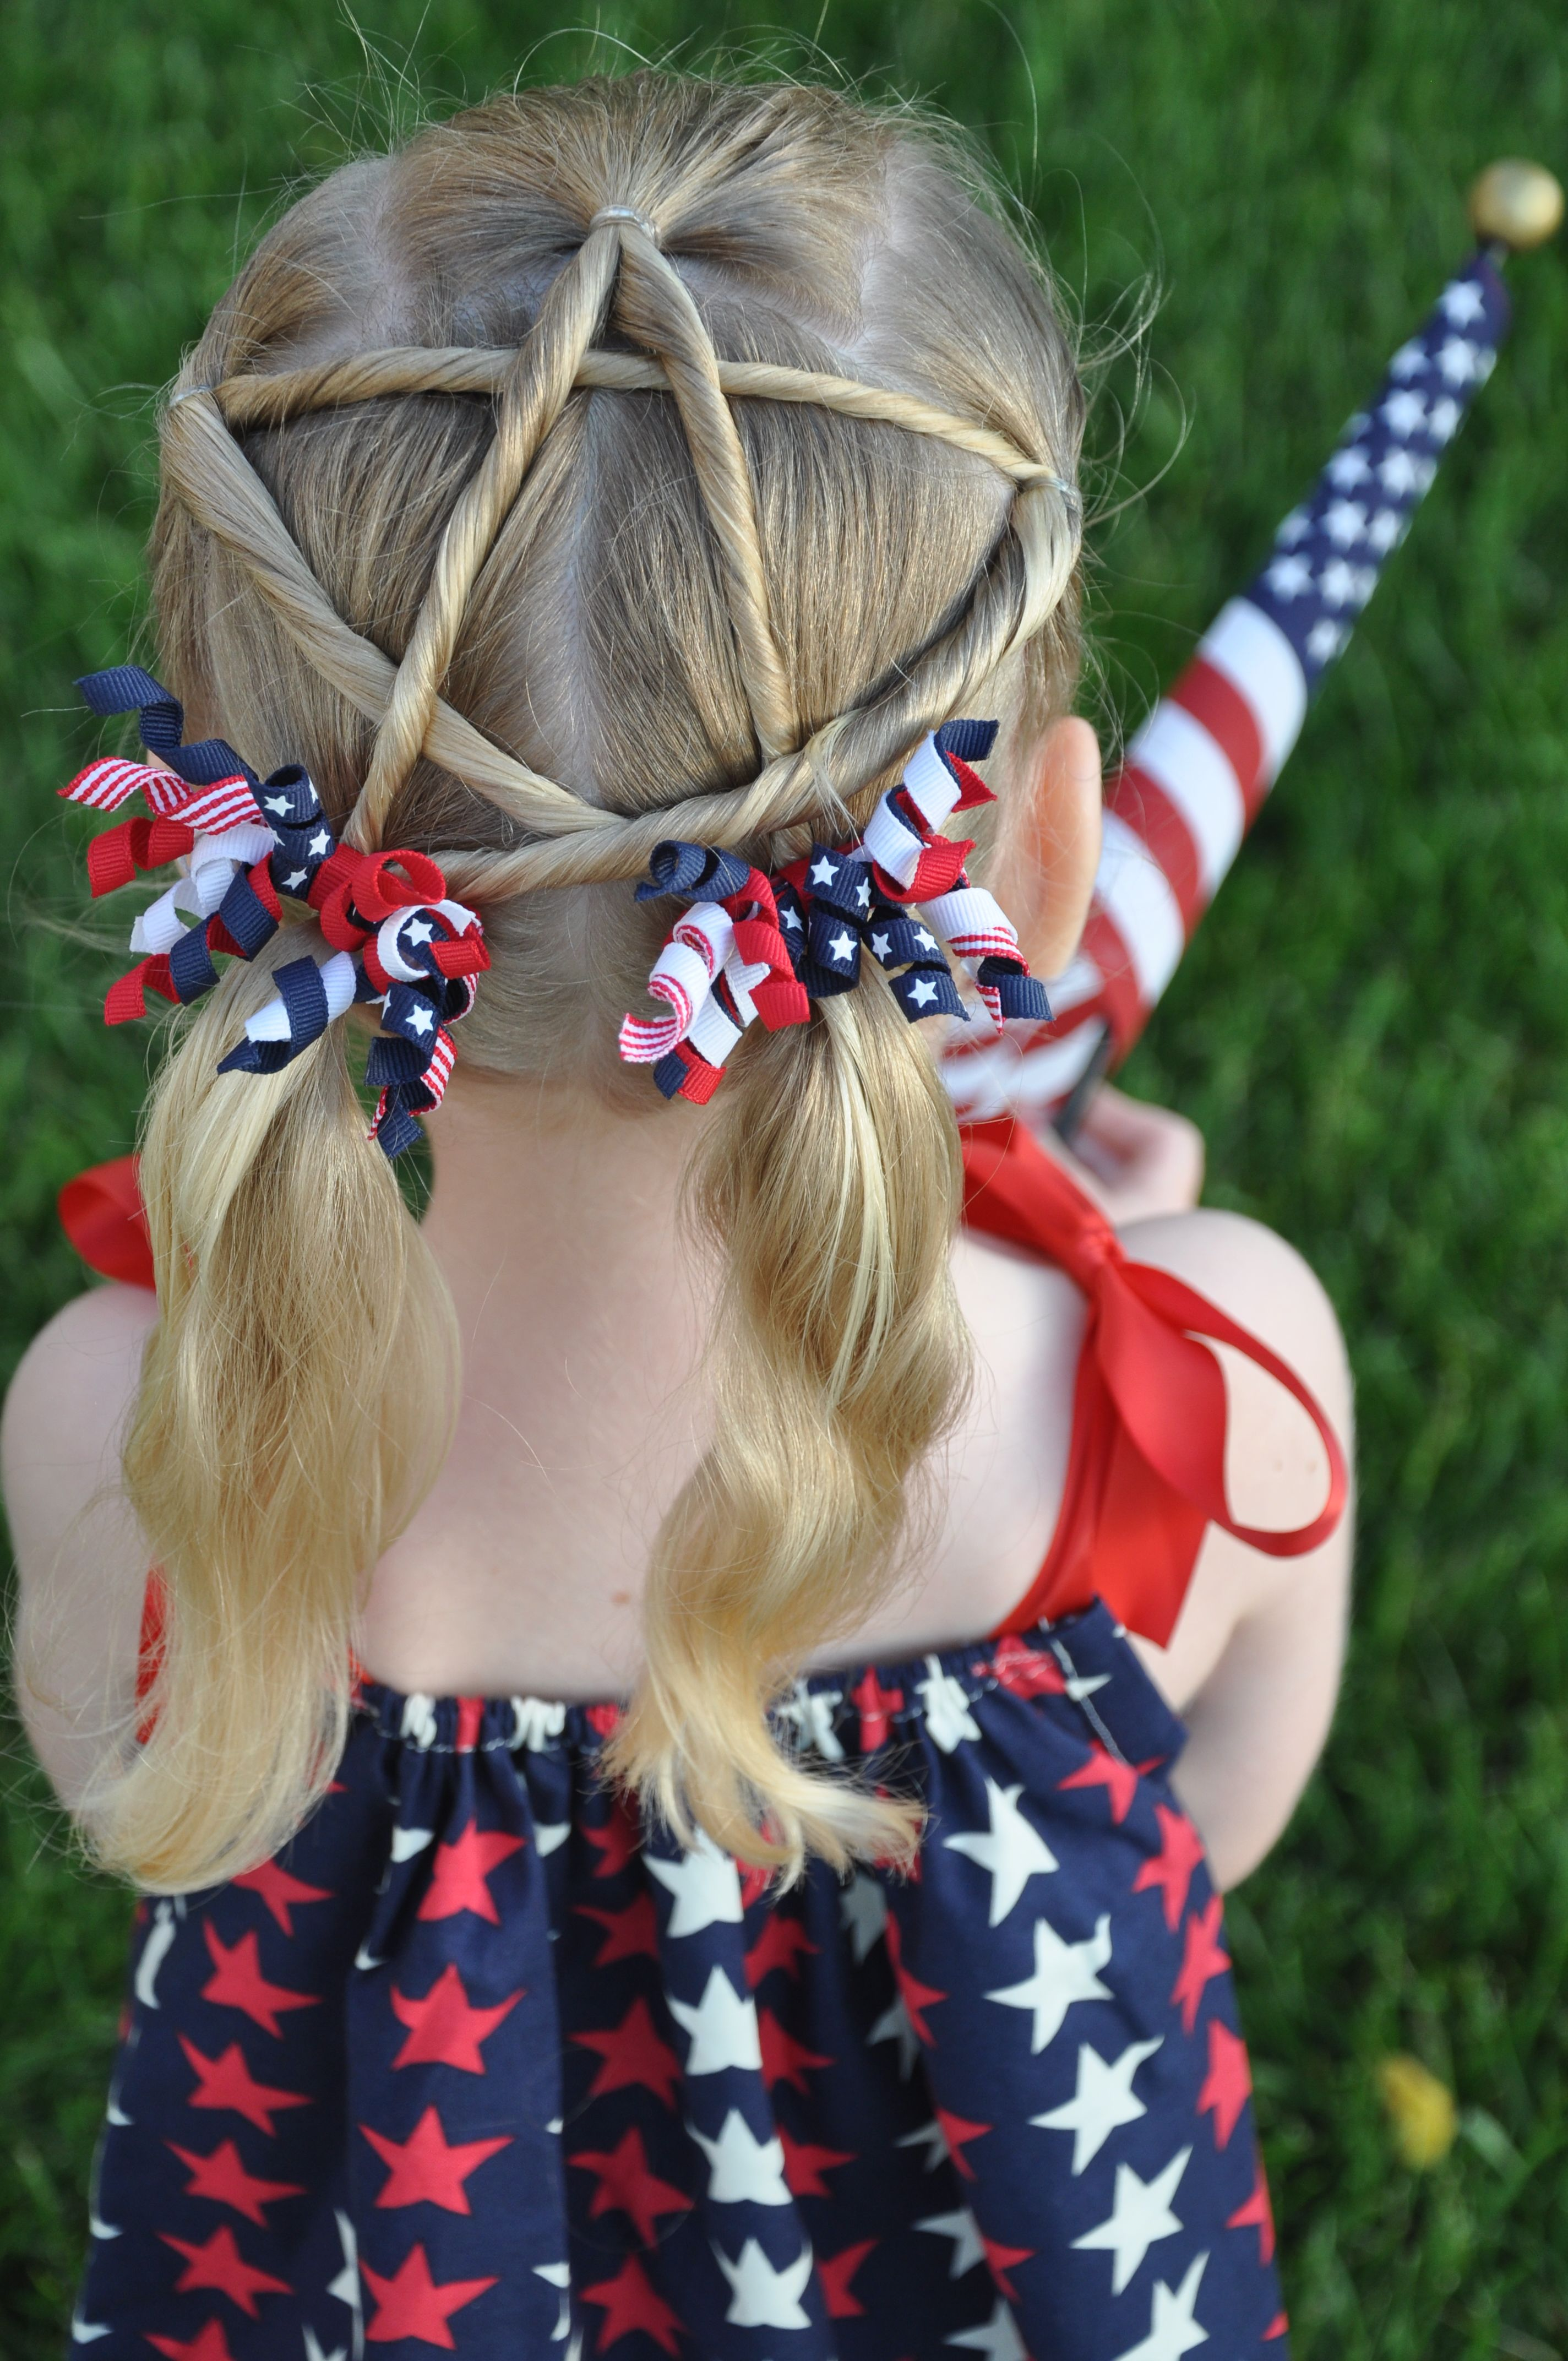 Super cute hair pinterest girl hair july holidays and hair band